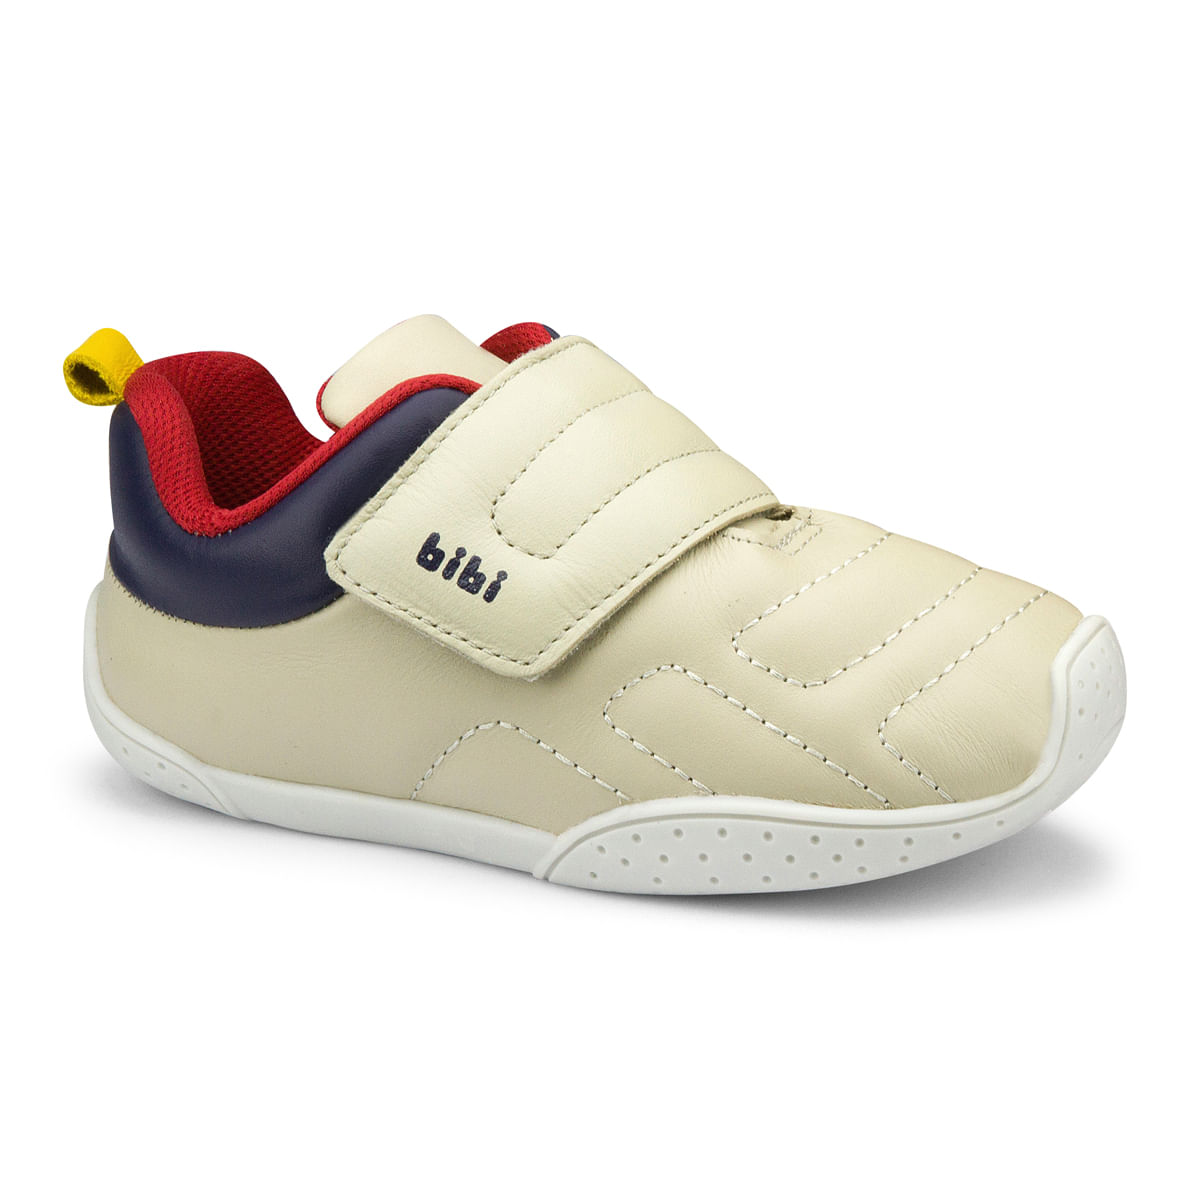 561a3134c93 Tênis Infantil Bibi Masculino Gelo Fisioflex 1063080 - Bibi Calçados